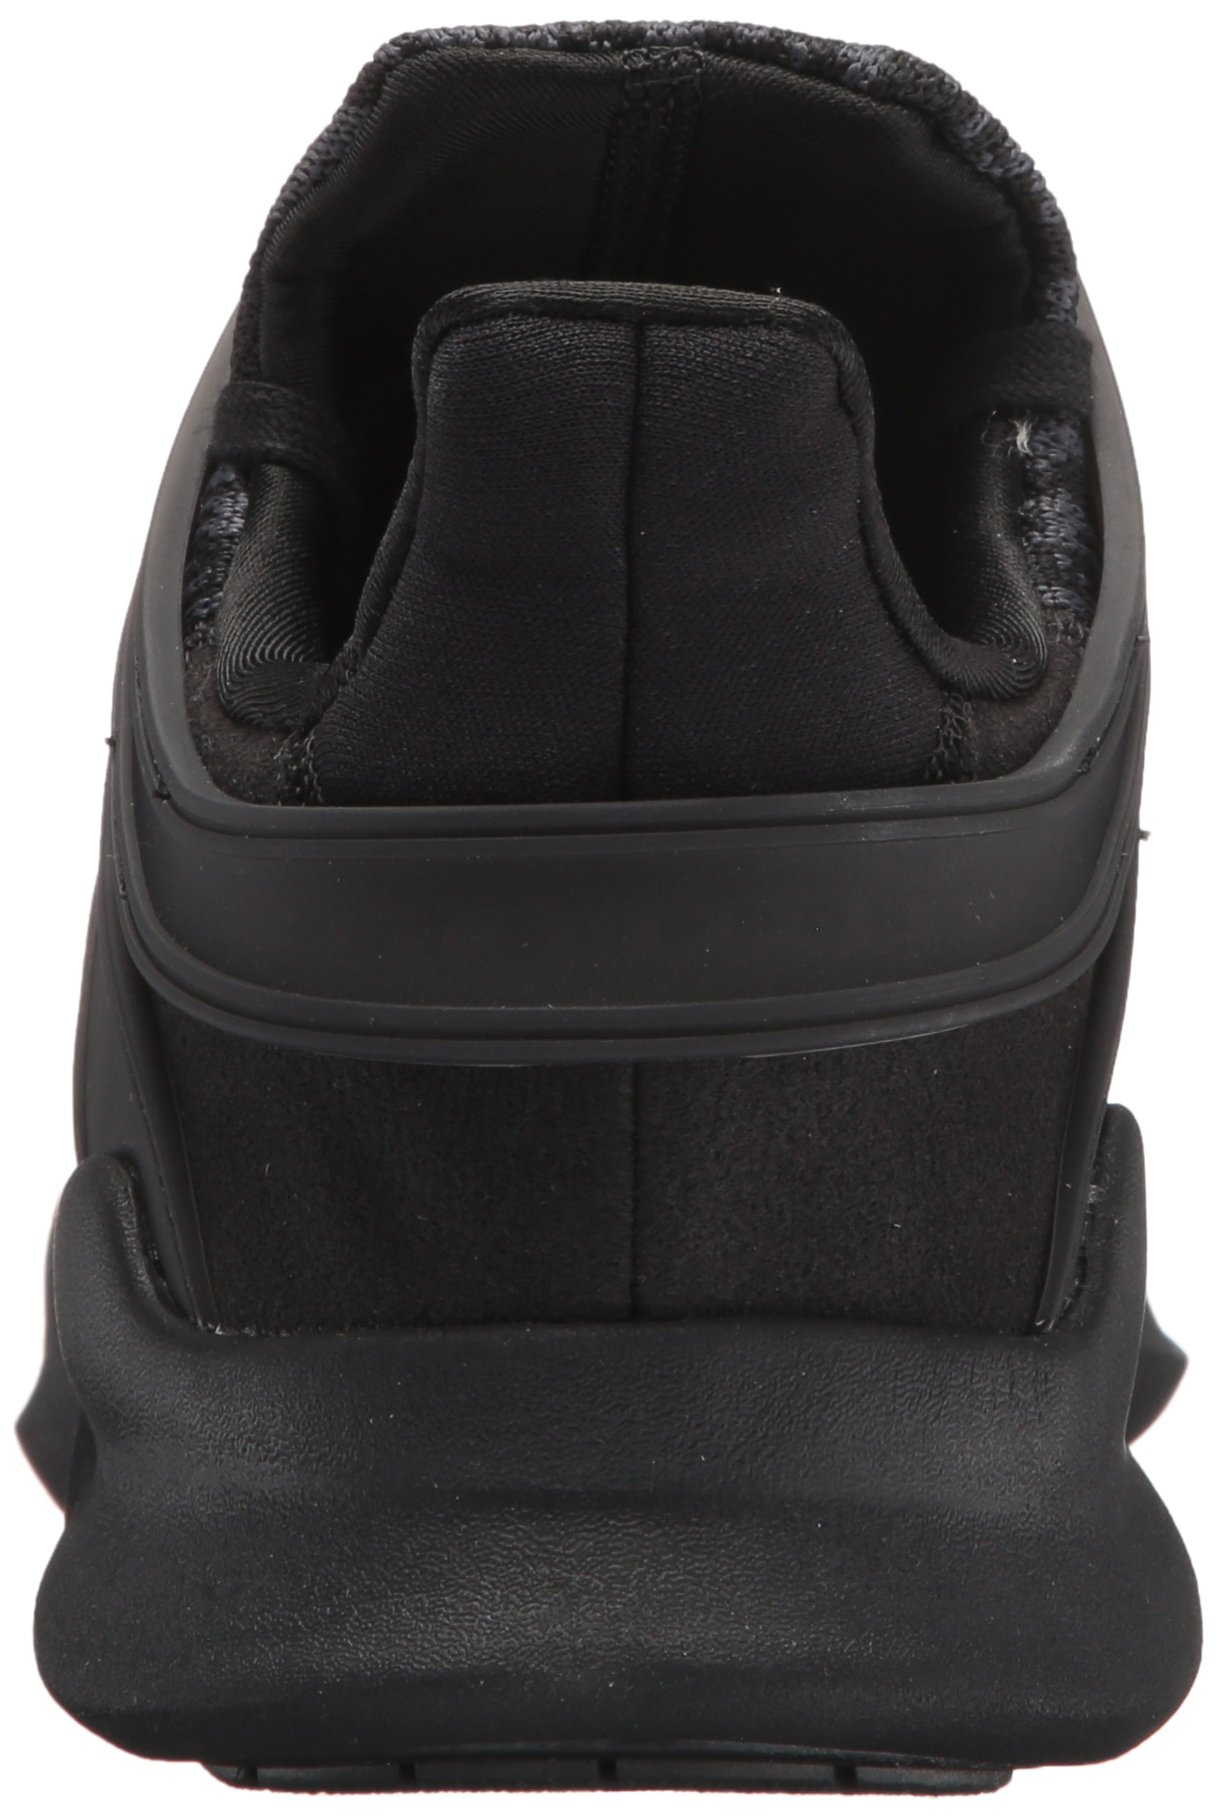 adidas Originals Boys' EQT Support ADV J Running Shoe, Black, 6.5 M US Big Kid by adidas Originals (Image #2)